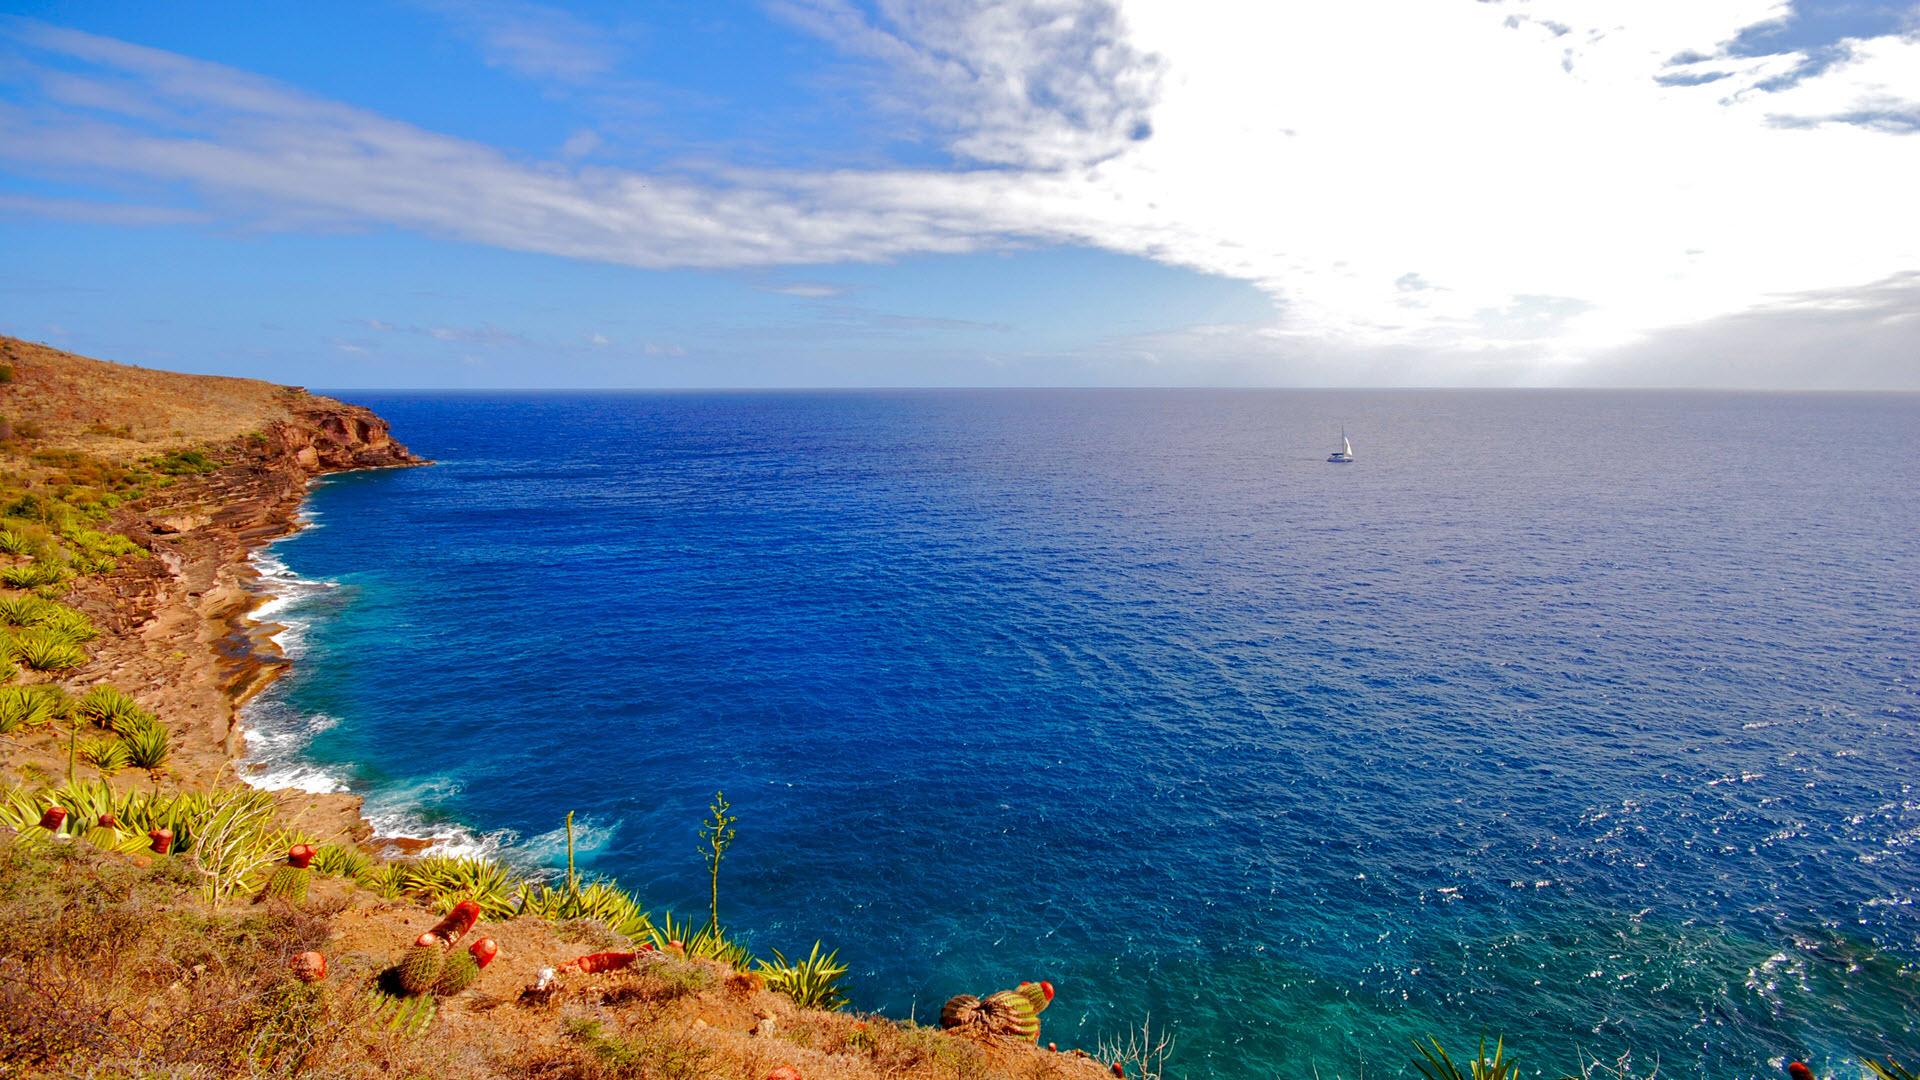 Sea Images Free Download wallpaper hd